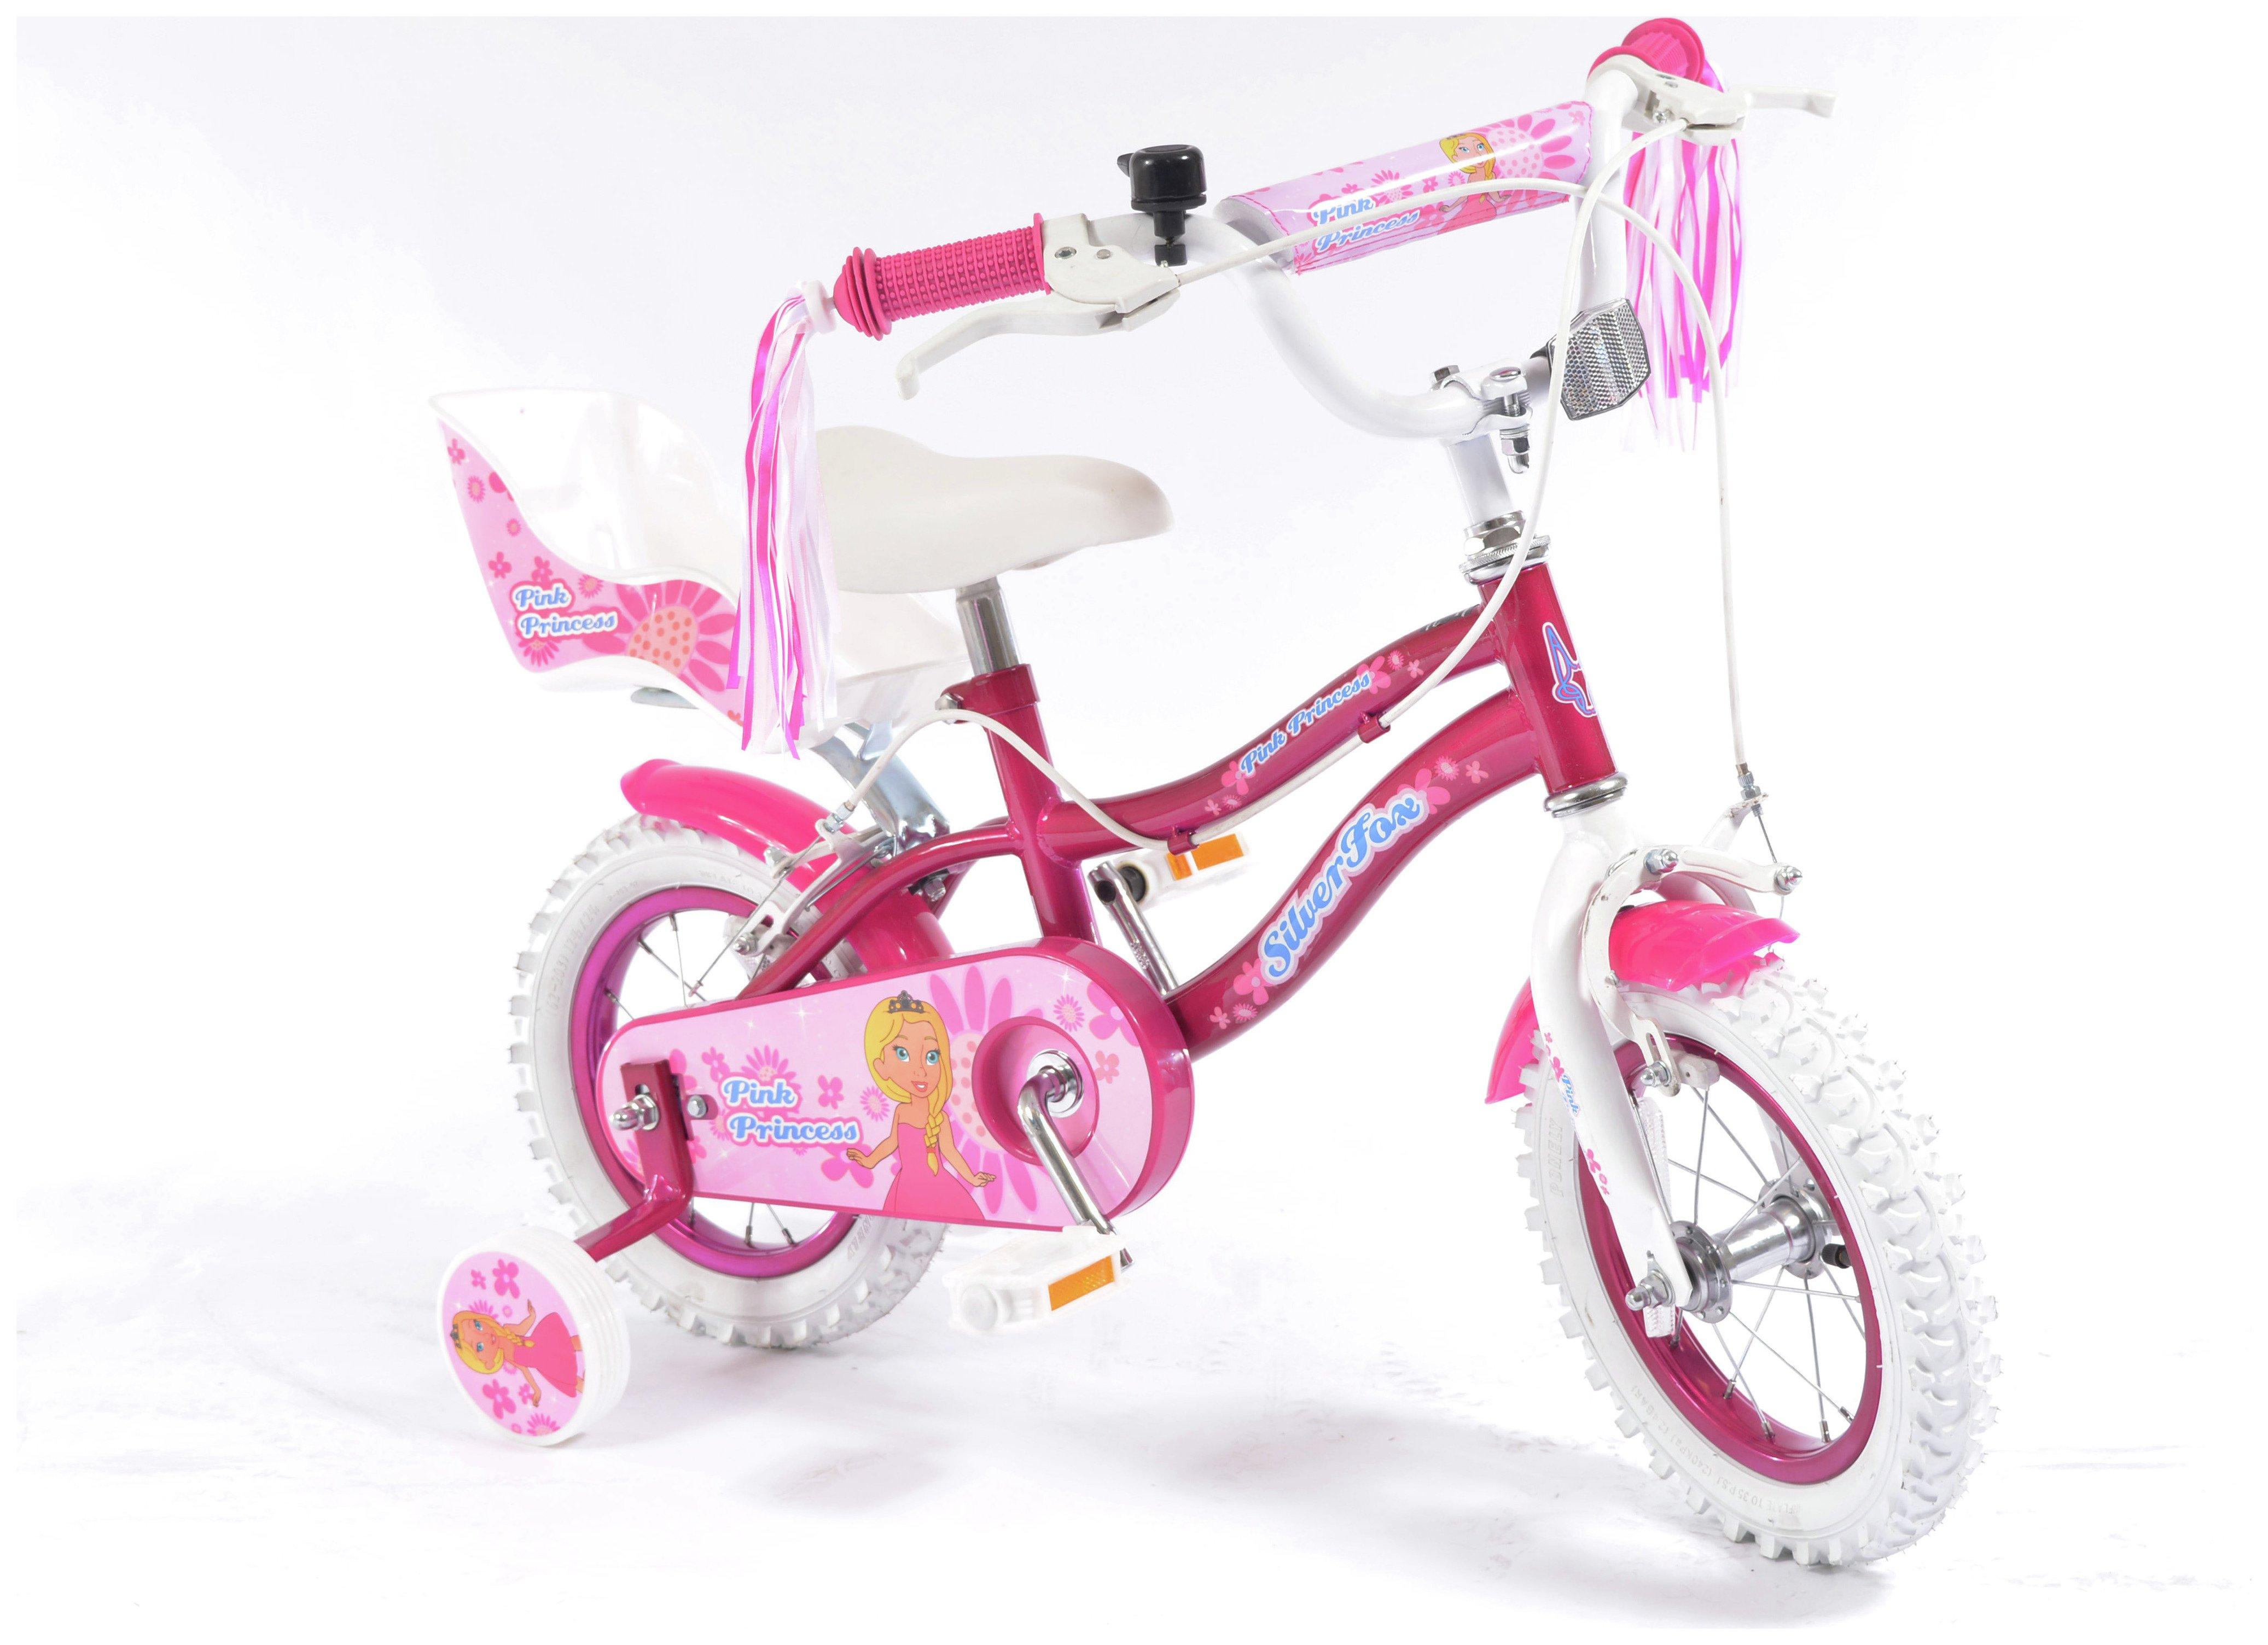 Silverfox Pink Princess 12 Inch Kids Bike